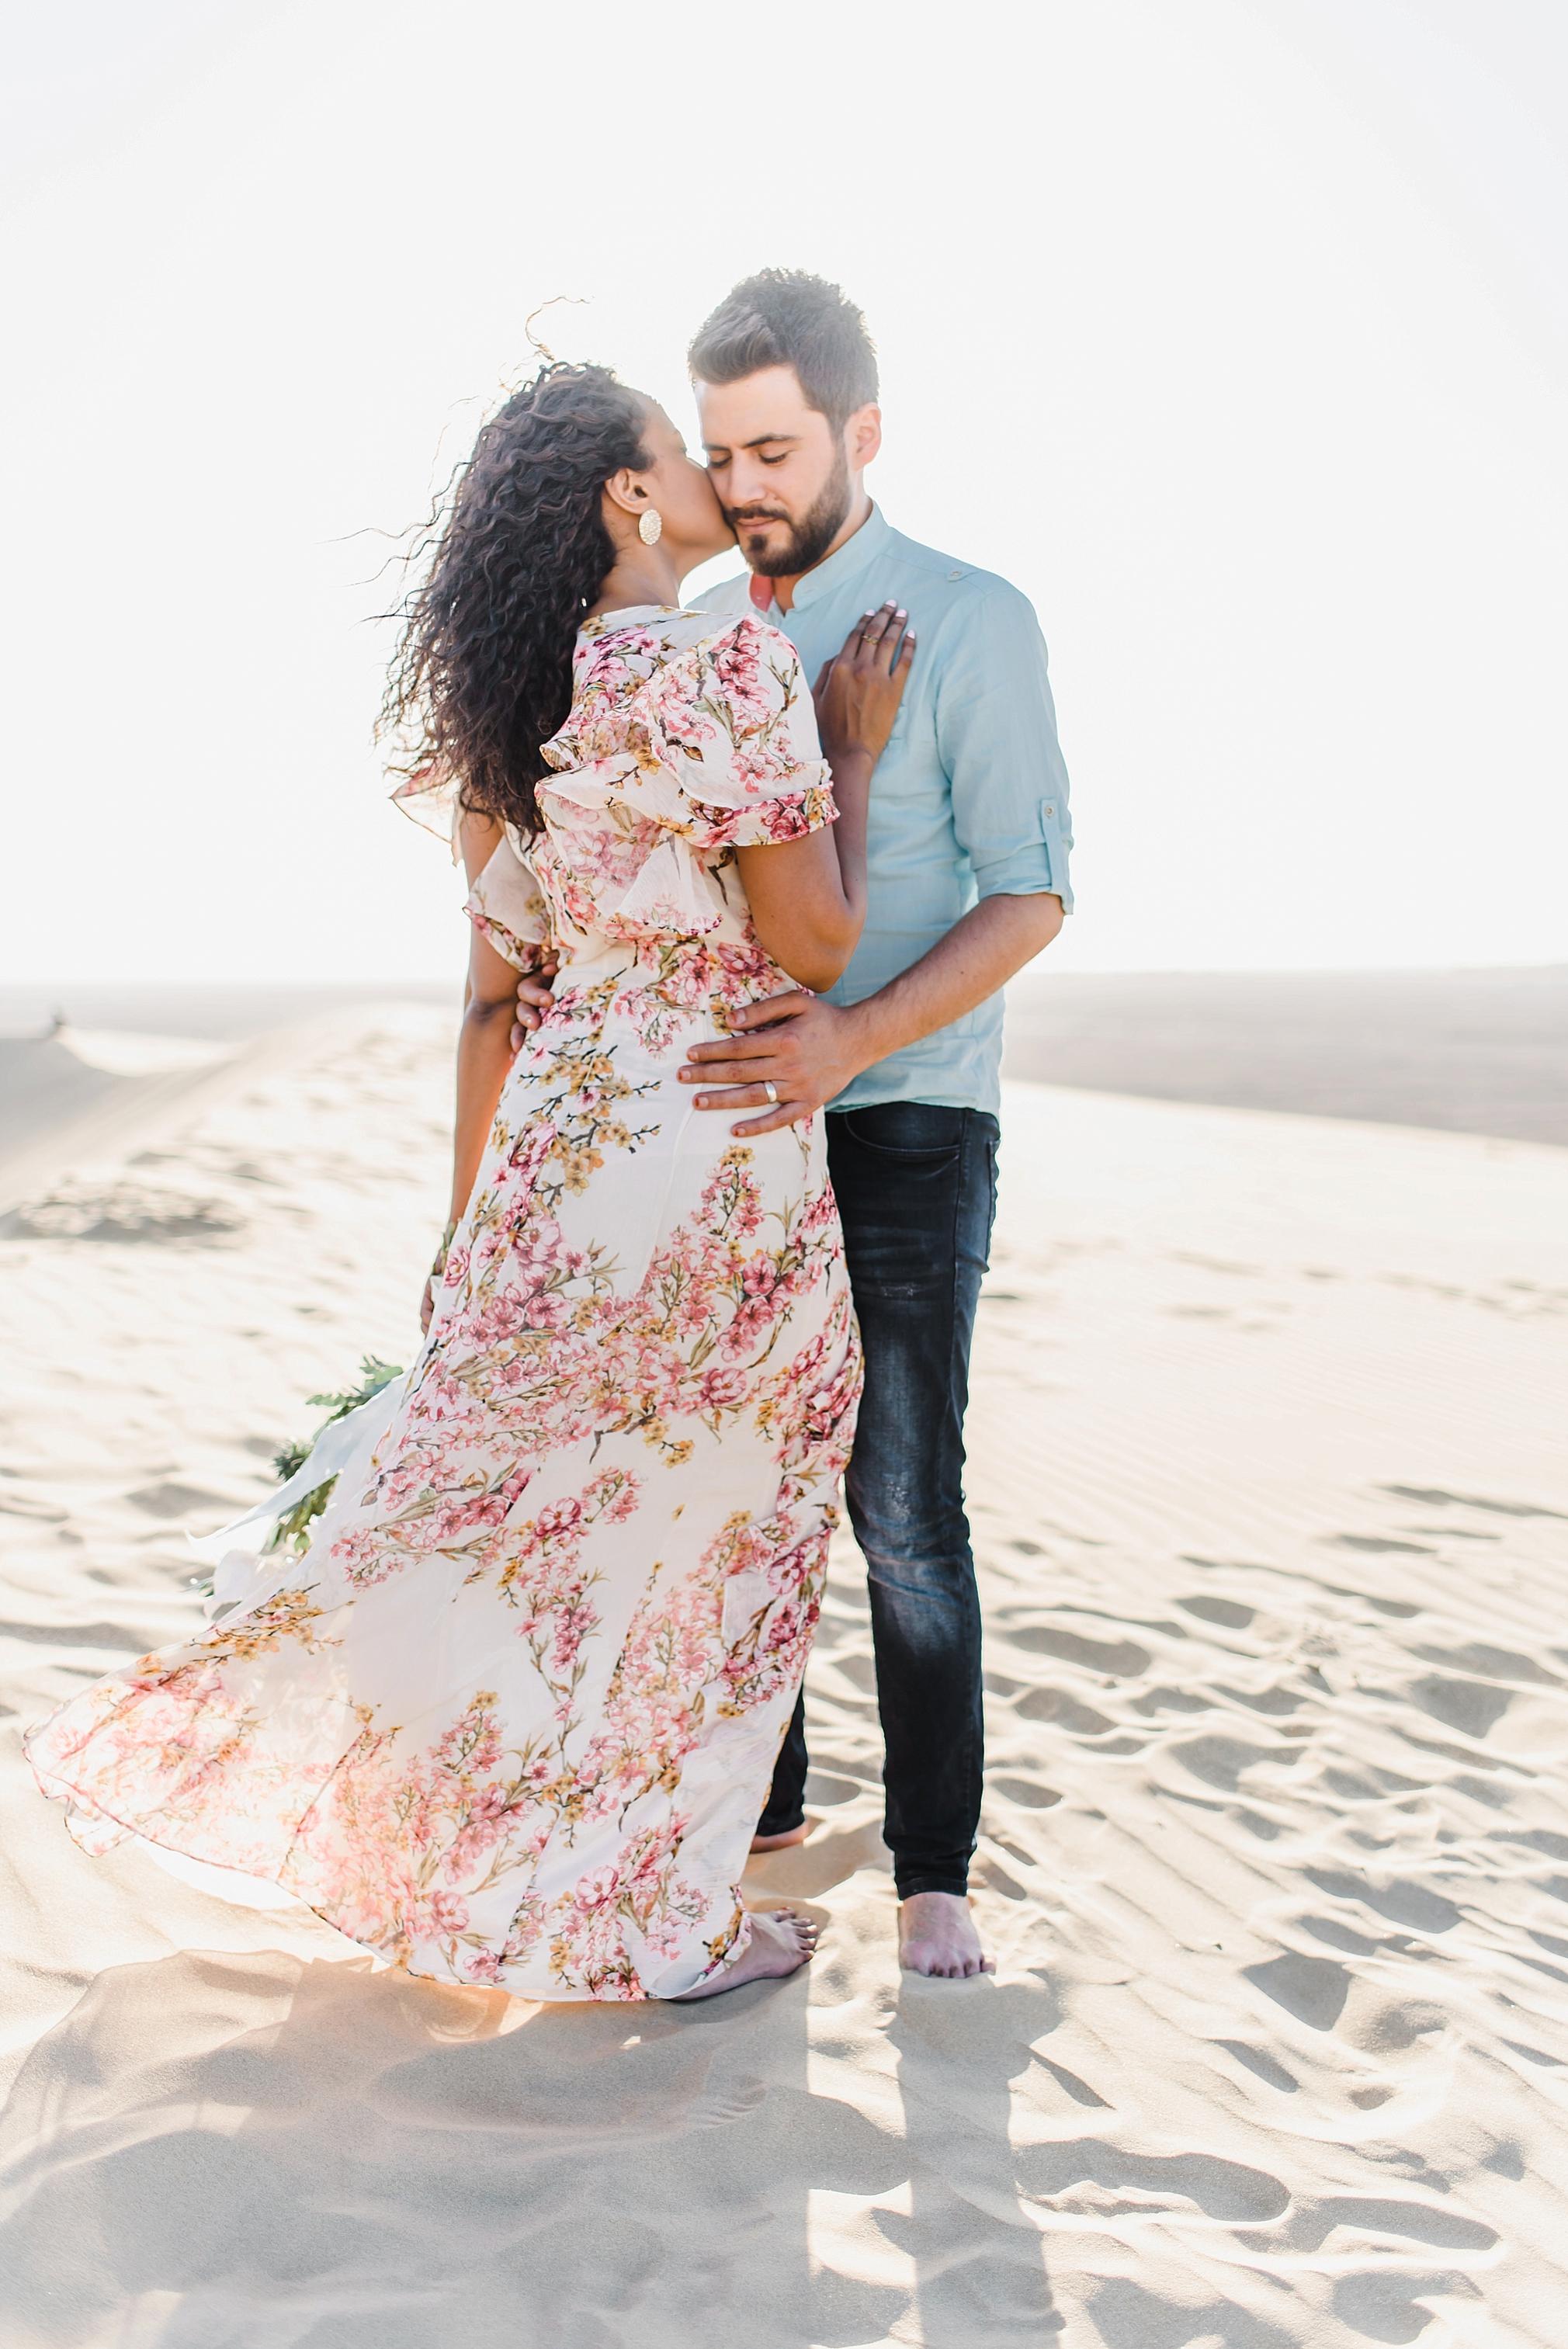 Singing Sand Dunes Desert Love Shoot   Ali and Batoul Photography_0024.jpg